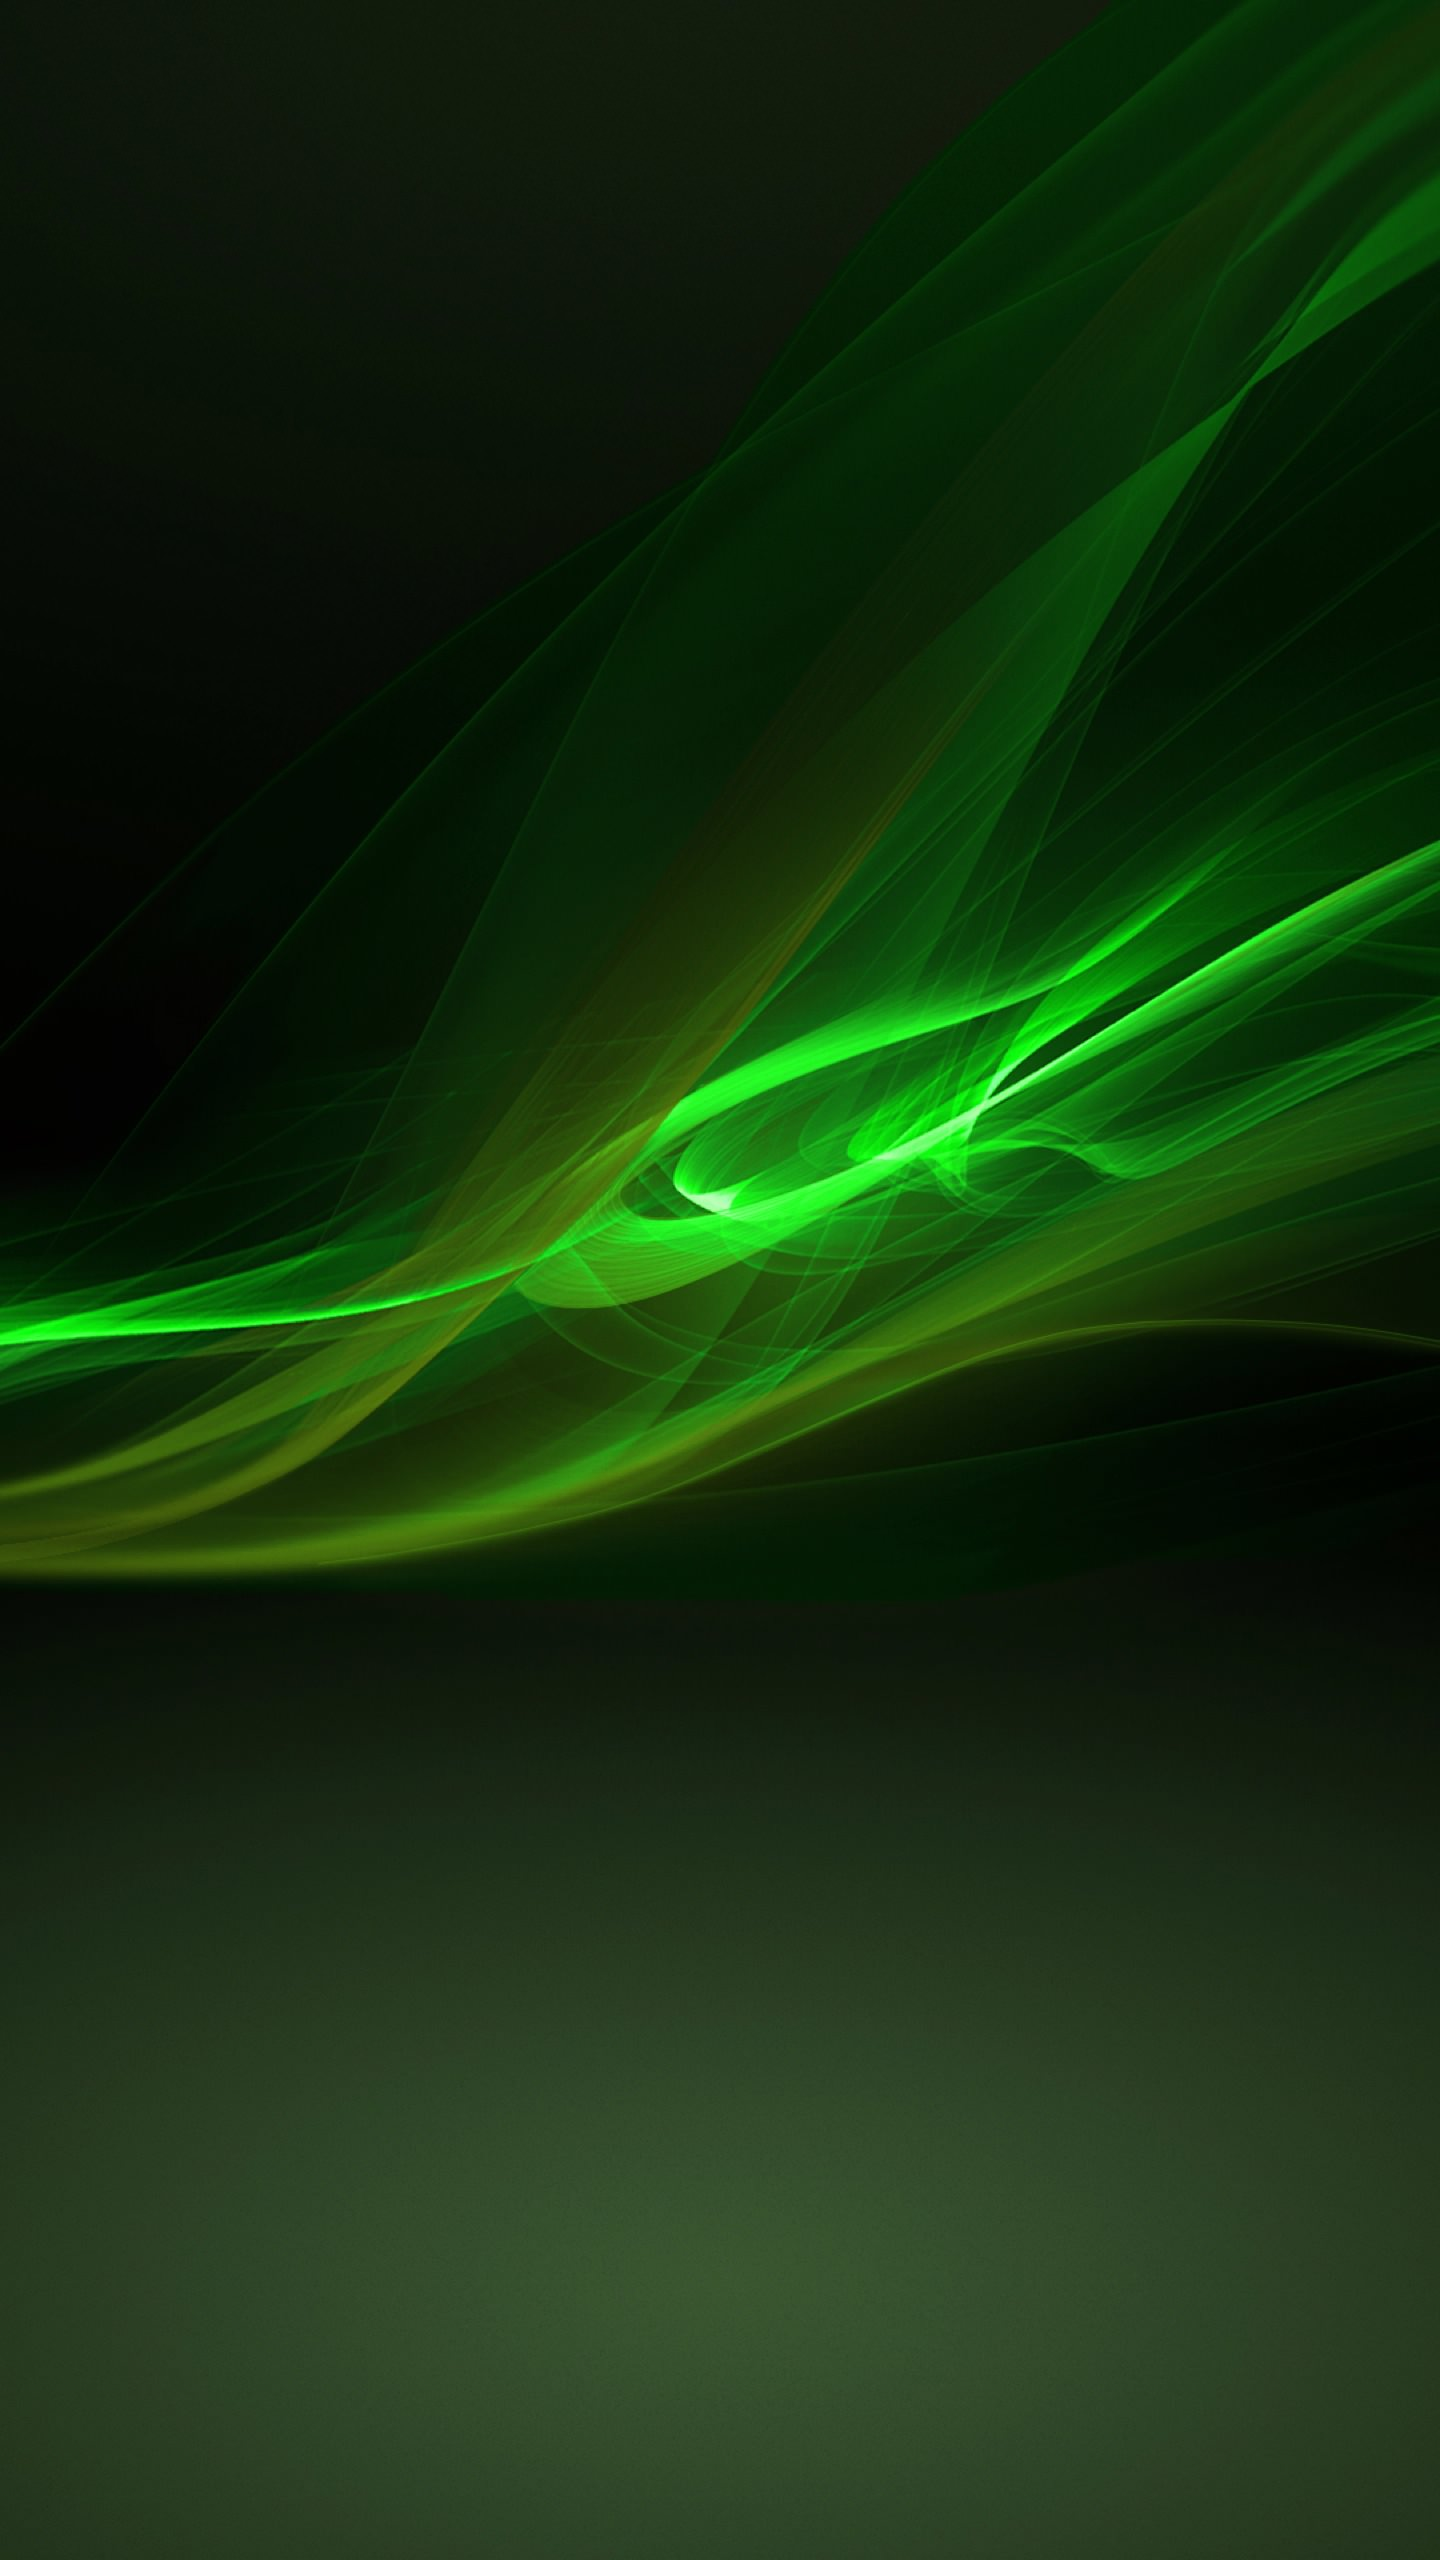 Green cool wallpaper smartphone smart phone wqhd wallpaper voltagebd Image collections